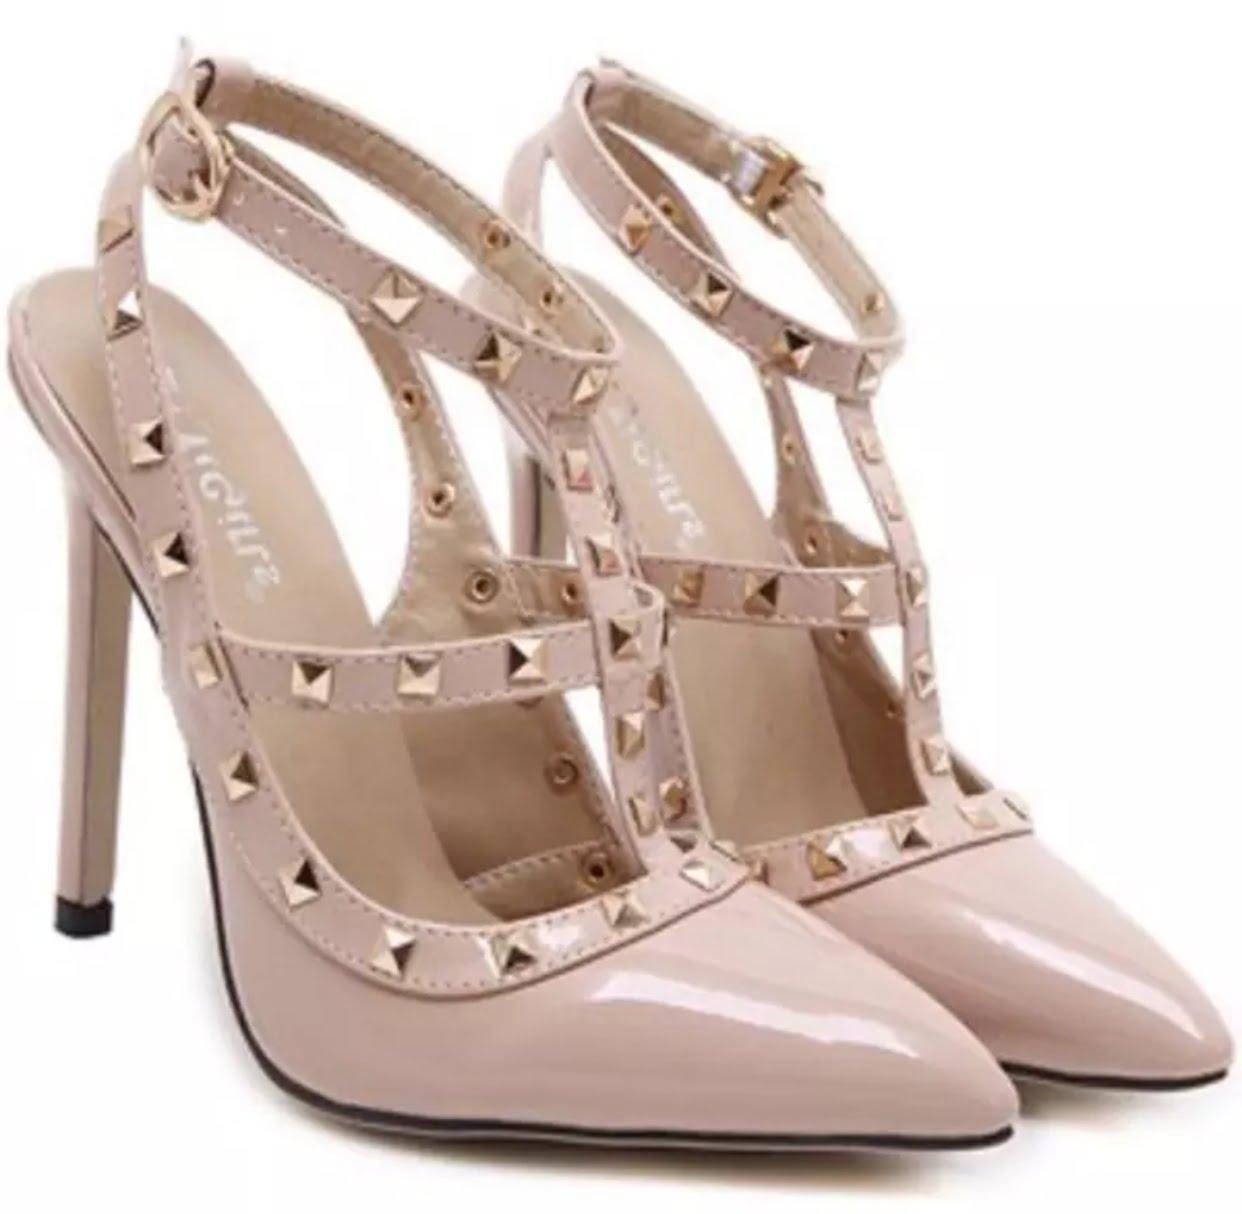 Nude work heels - Madame Alpha